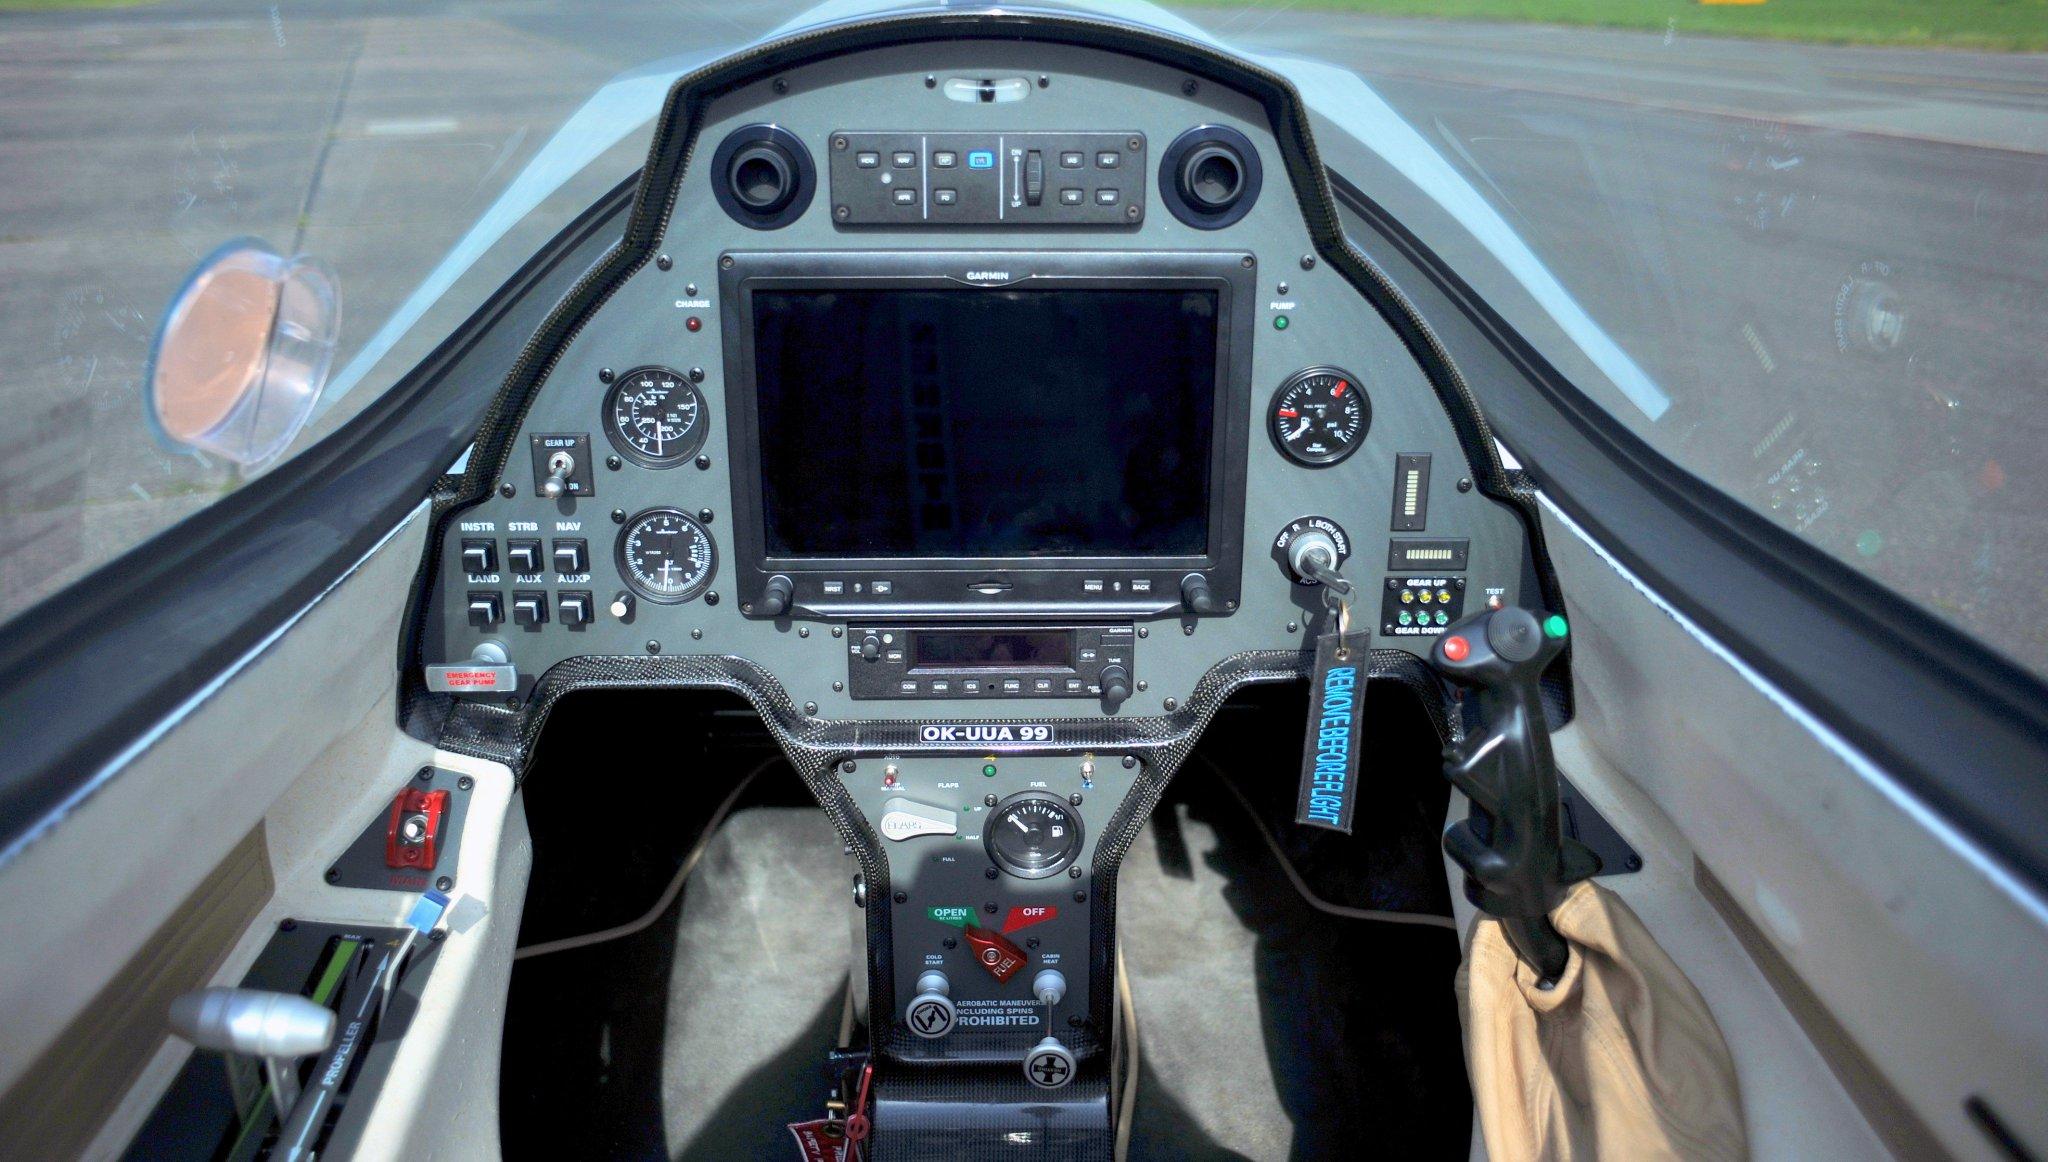 The Cockpit radio stream - Listen online for free